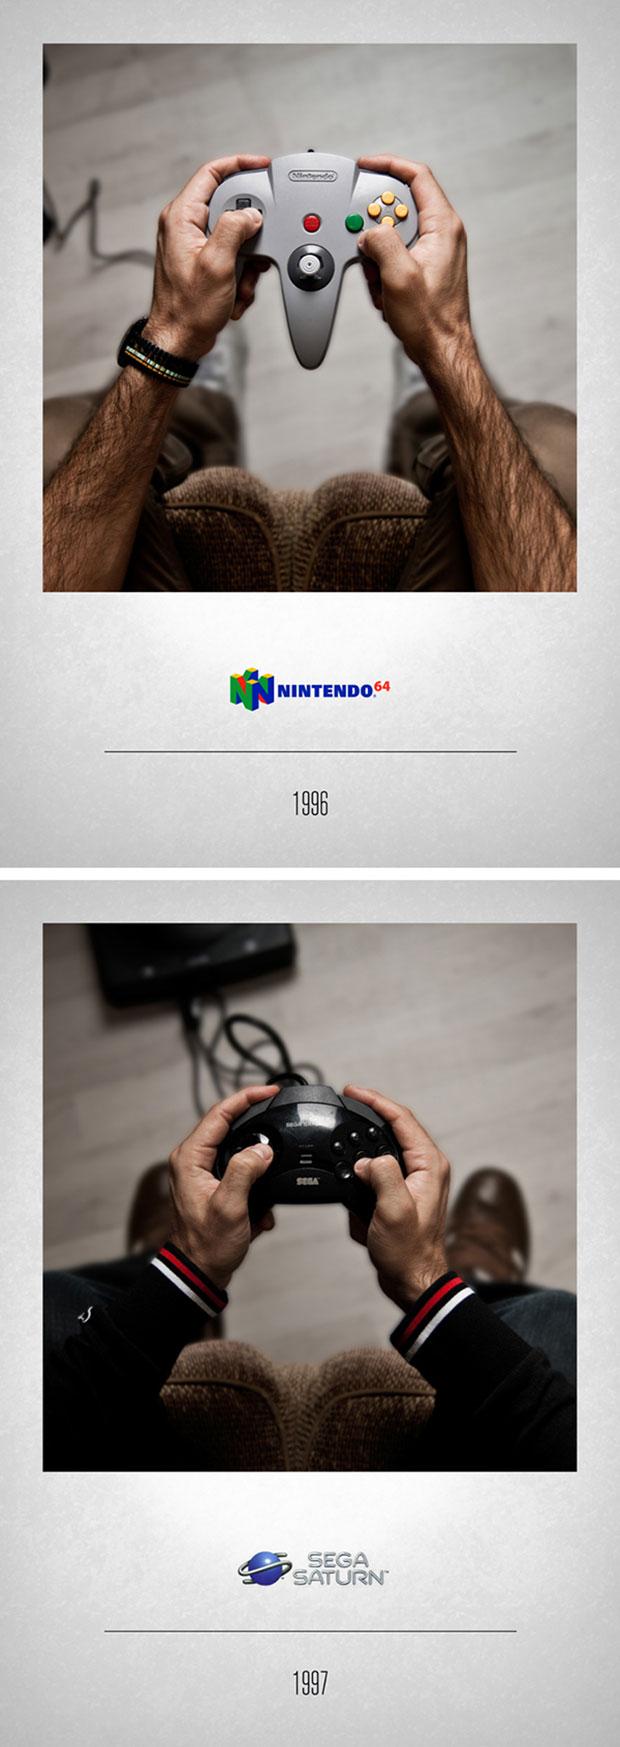 esq-video-controller-history-11-uZ30Nr-12